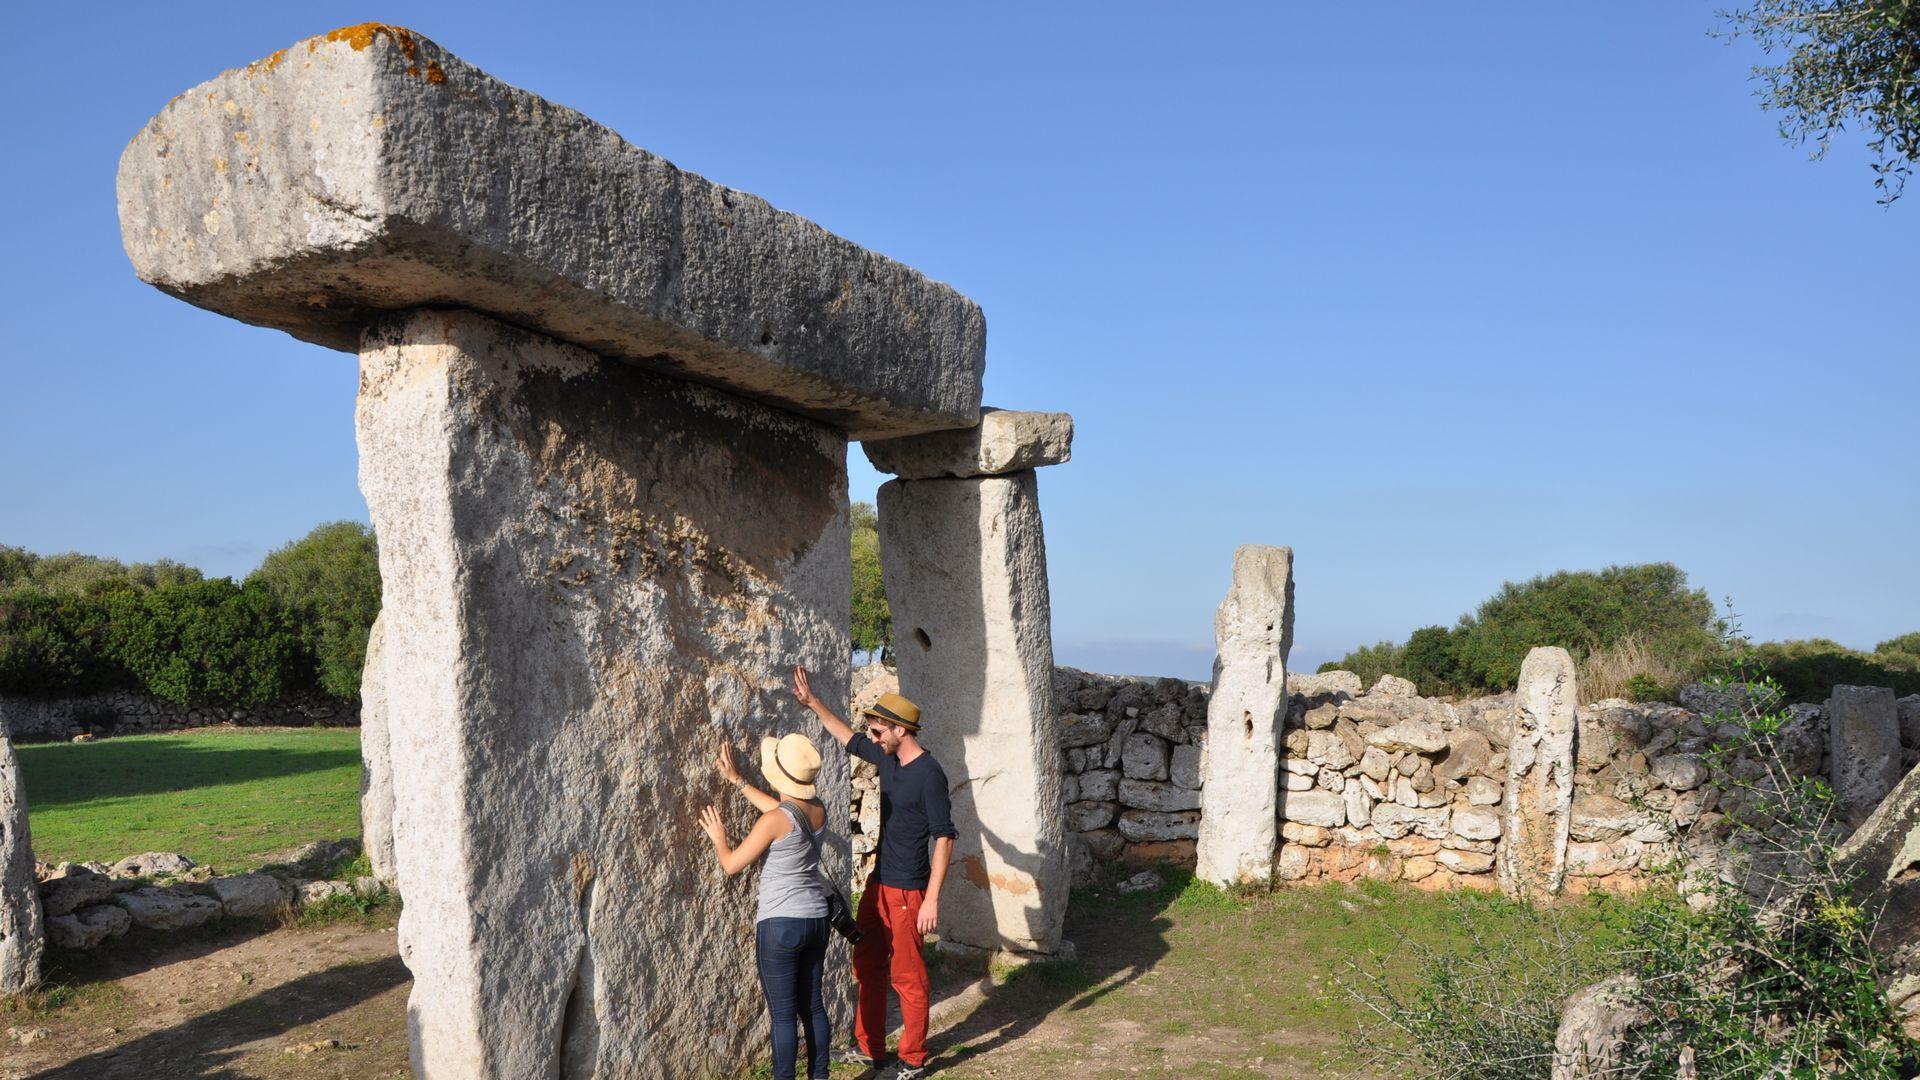 Yacimiento arqueológico Talaiot Talatí de Dalt en Menorca